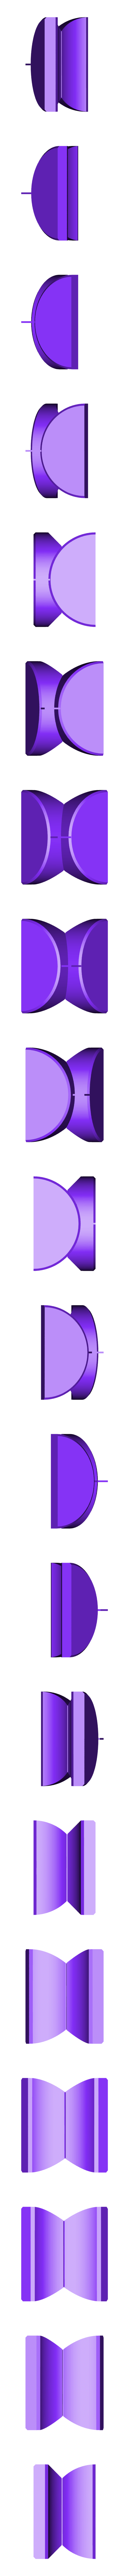 lément_9_chanfrein.stl Download free STL file CUBE puzzle • 3D printer model, NOP21